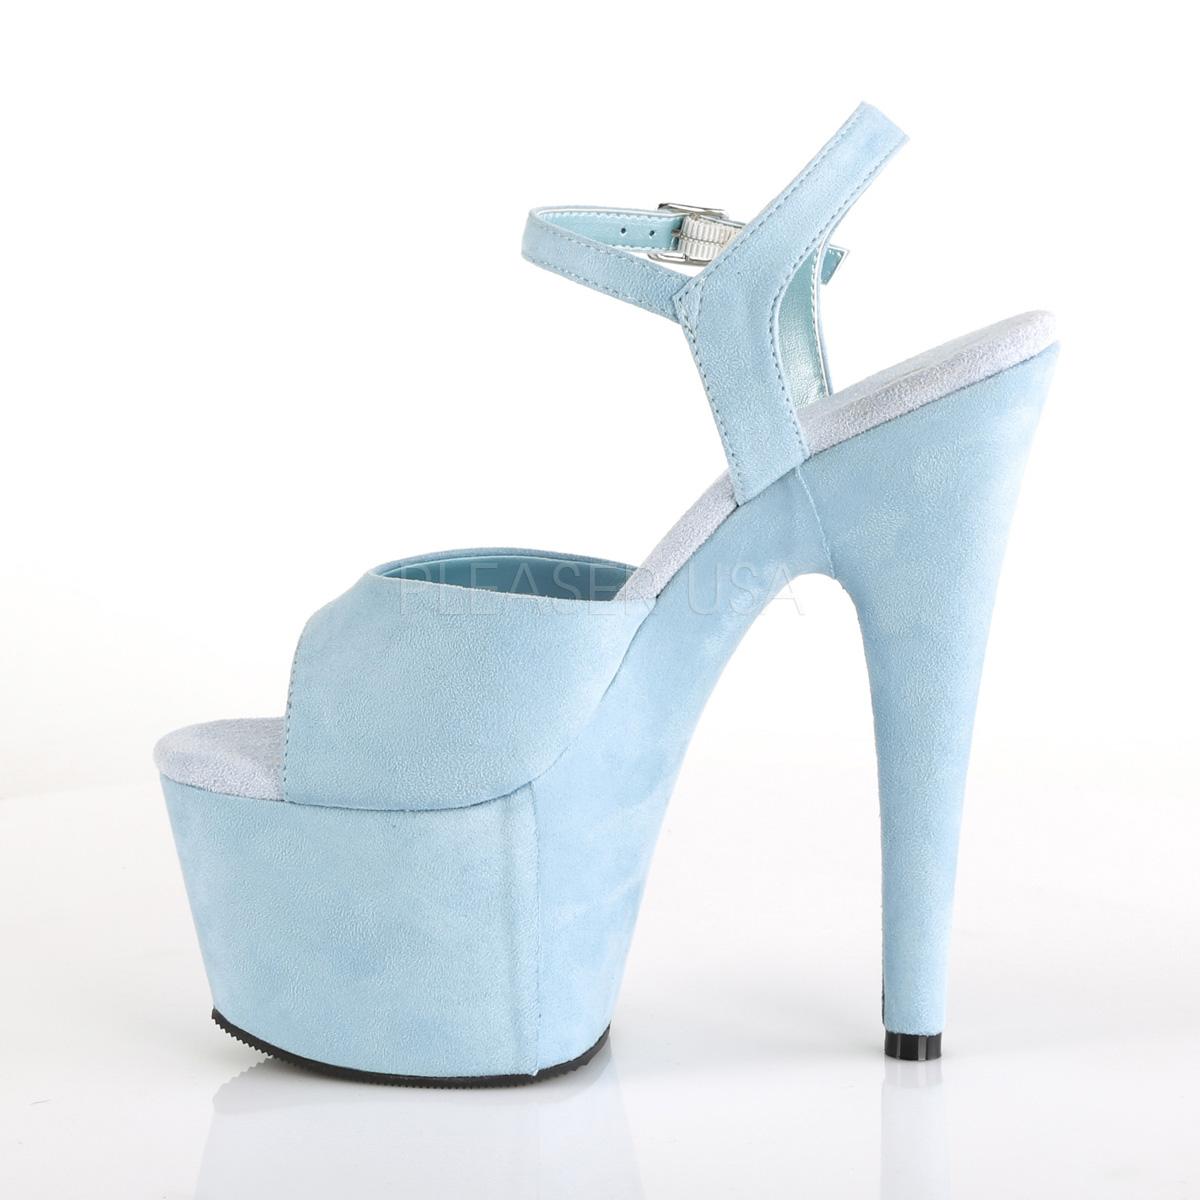 fbf86895ea8 Platform High Heels ADORE-709FS - Baby Blue